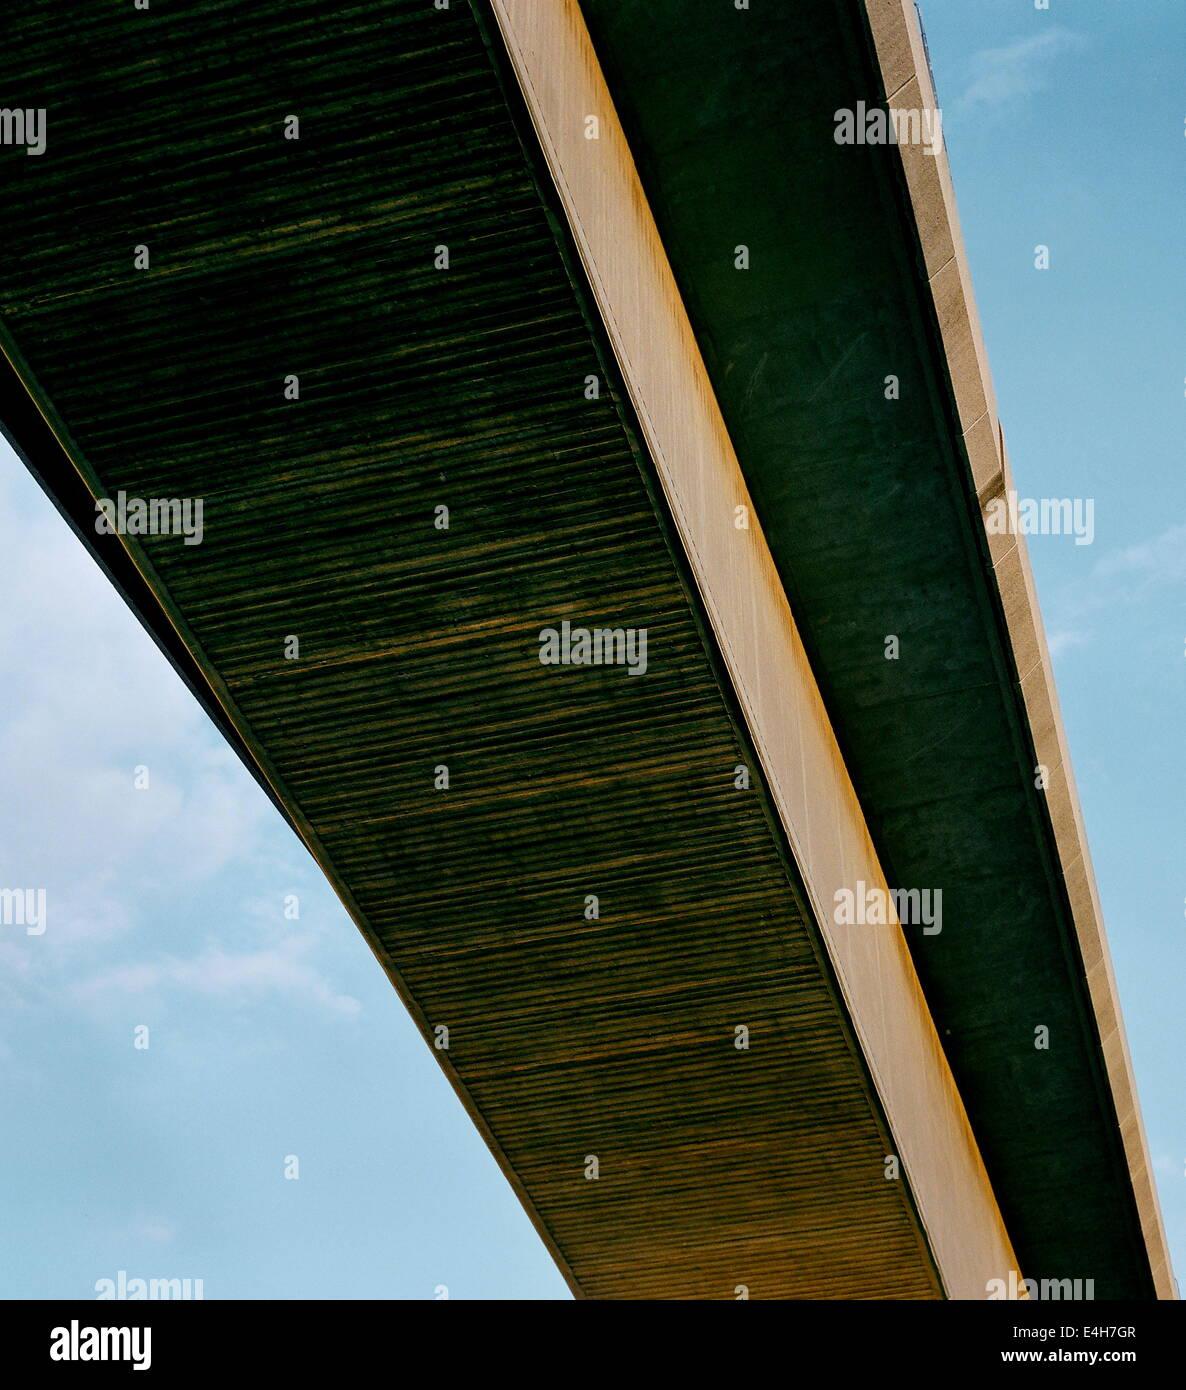 SOUTHAMPTON,ENGLAND.-REINFORCED CONCRETE SPAN OF THE ITCHEN BRIDGE.  PHOTO:JONATHAN EASTLAND/AJAX - Stock Image